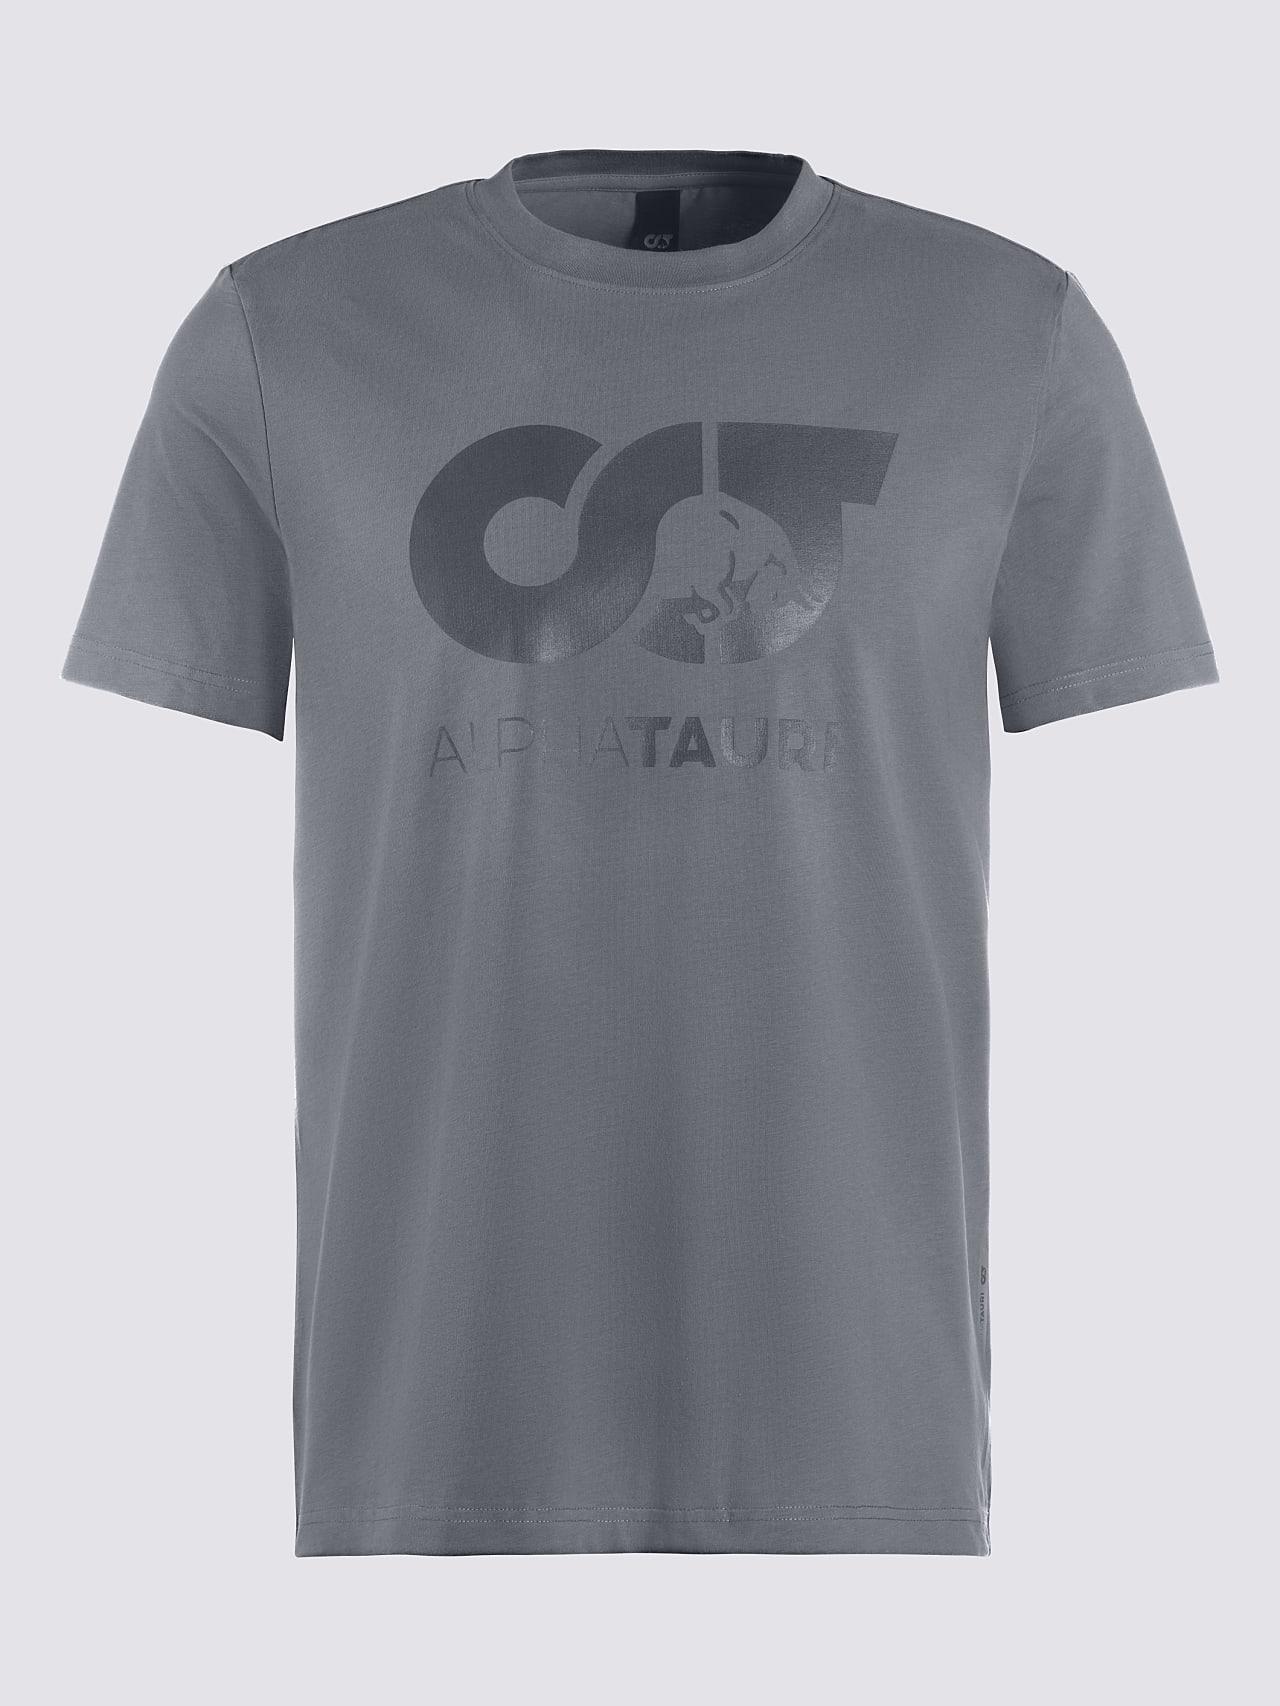 JERO V2.Y4.02 Signature Logo T-Shirt Grey Back Alpha Tauri